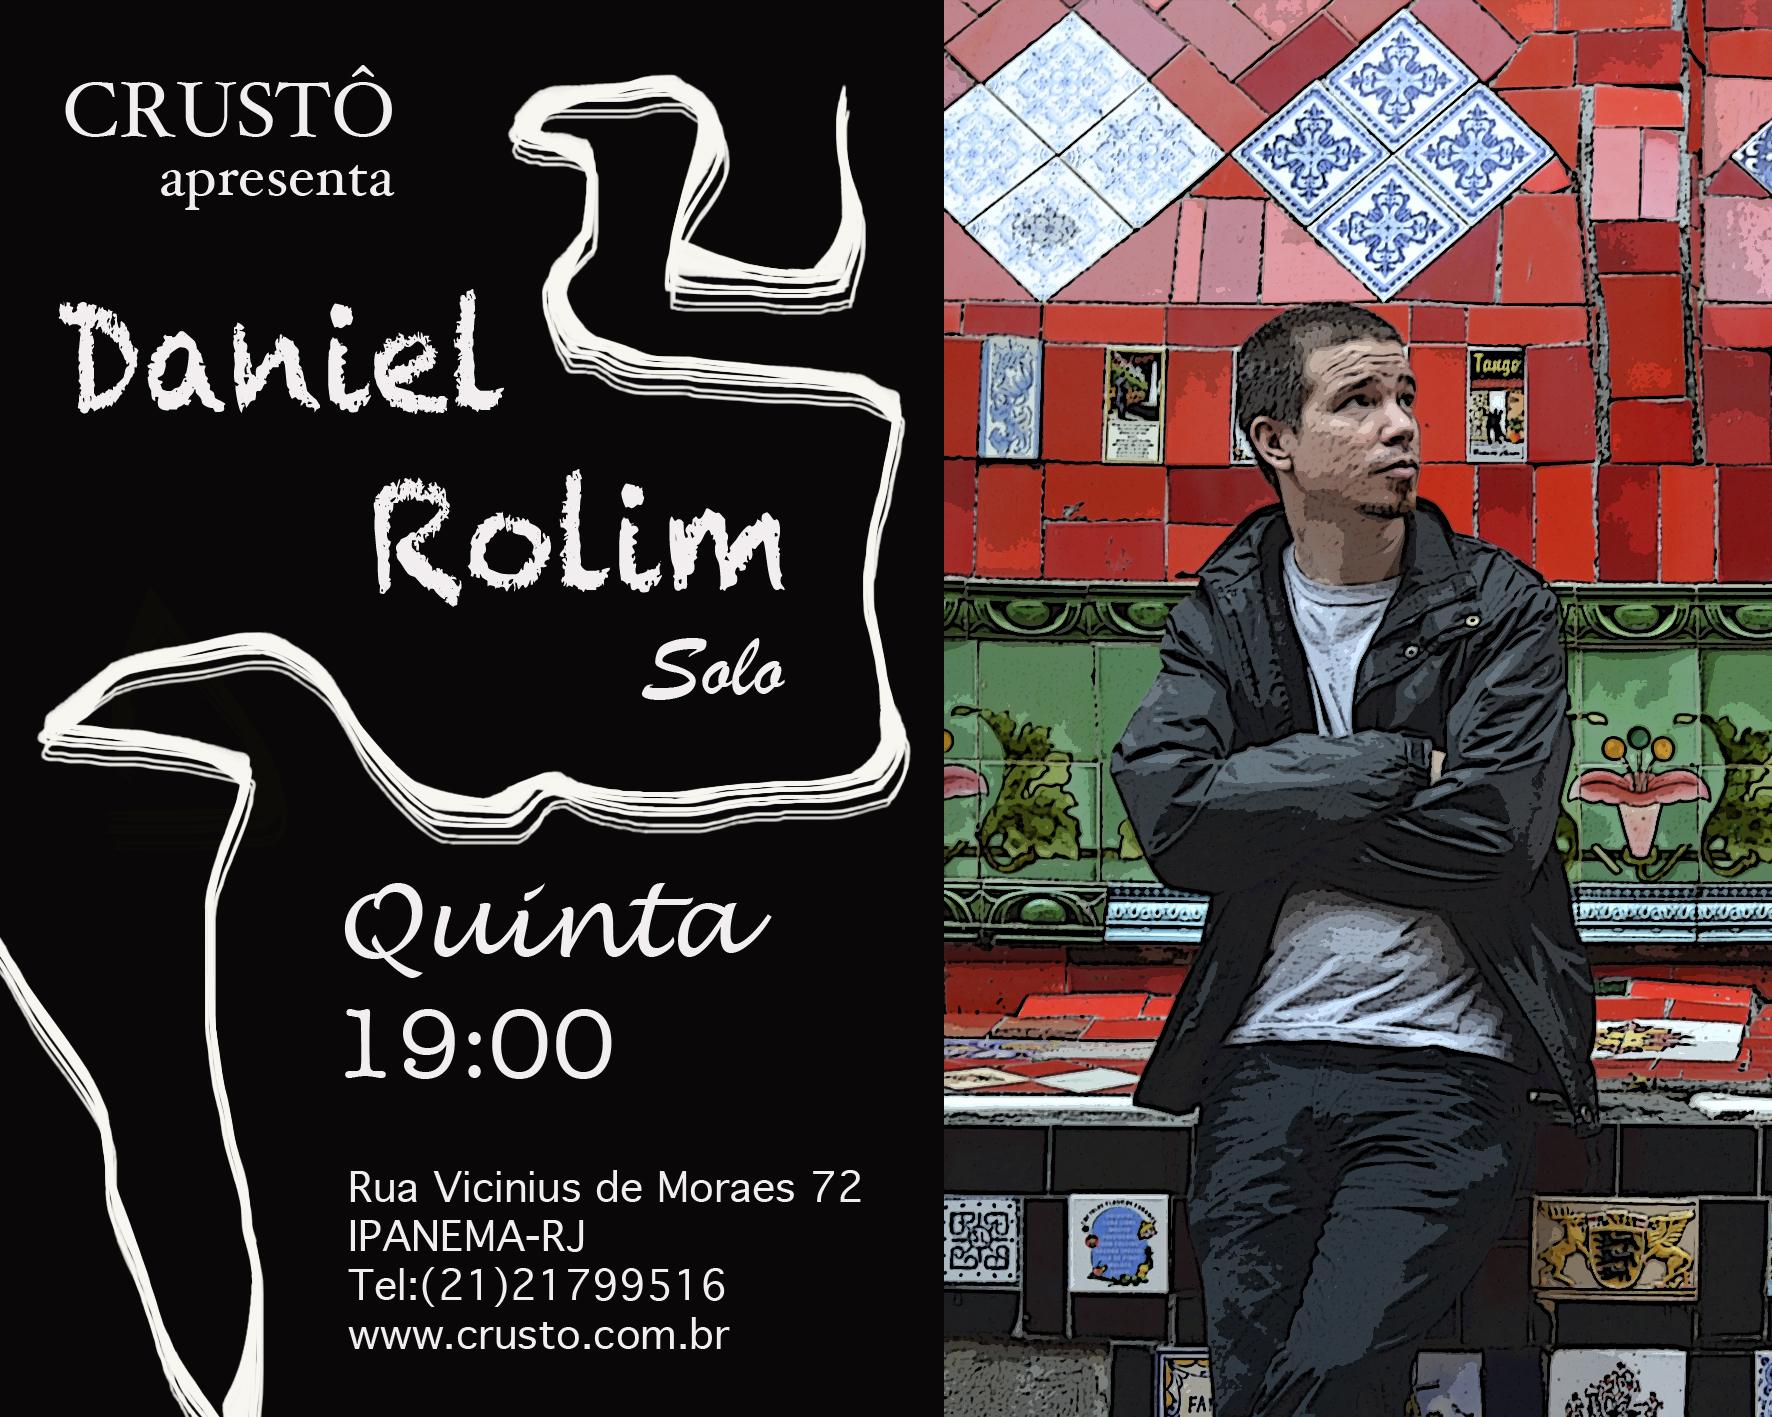 Daniel Rolim no Crusto (Ipanema)